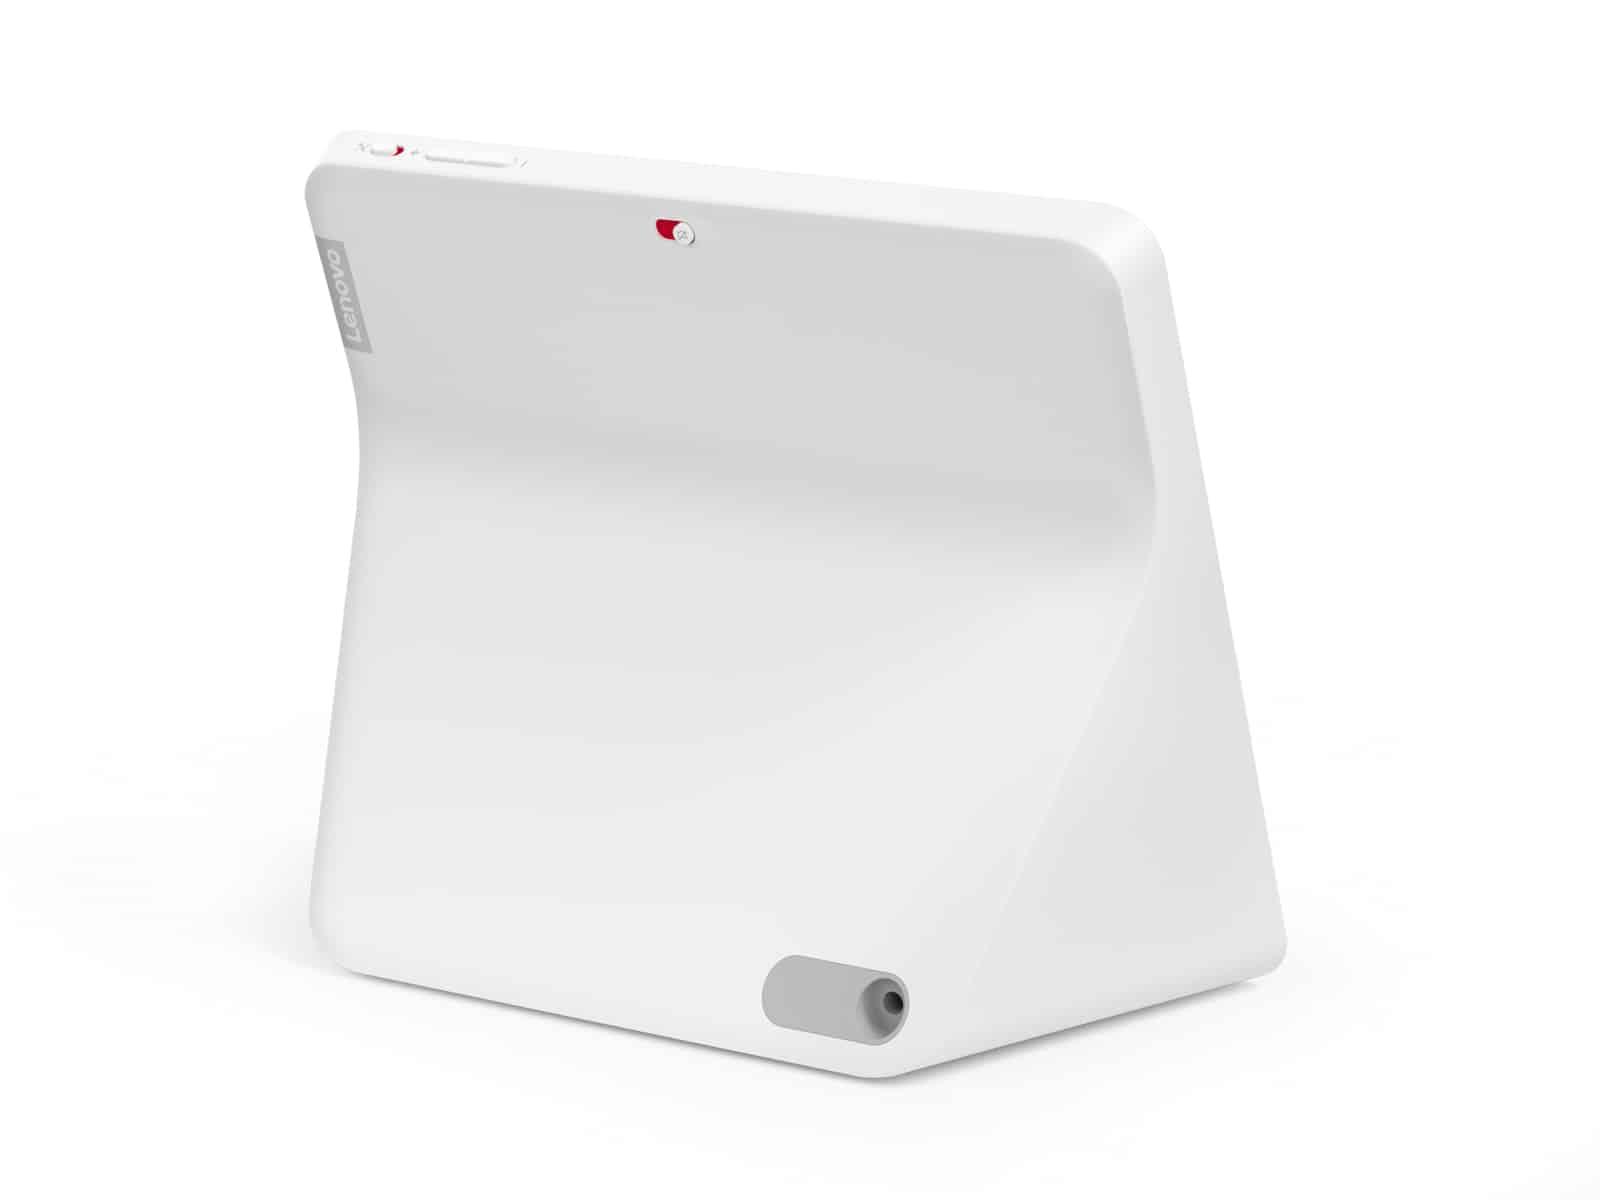 Lenovo Smart Display 7 Rear